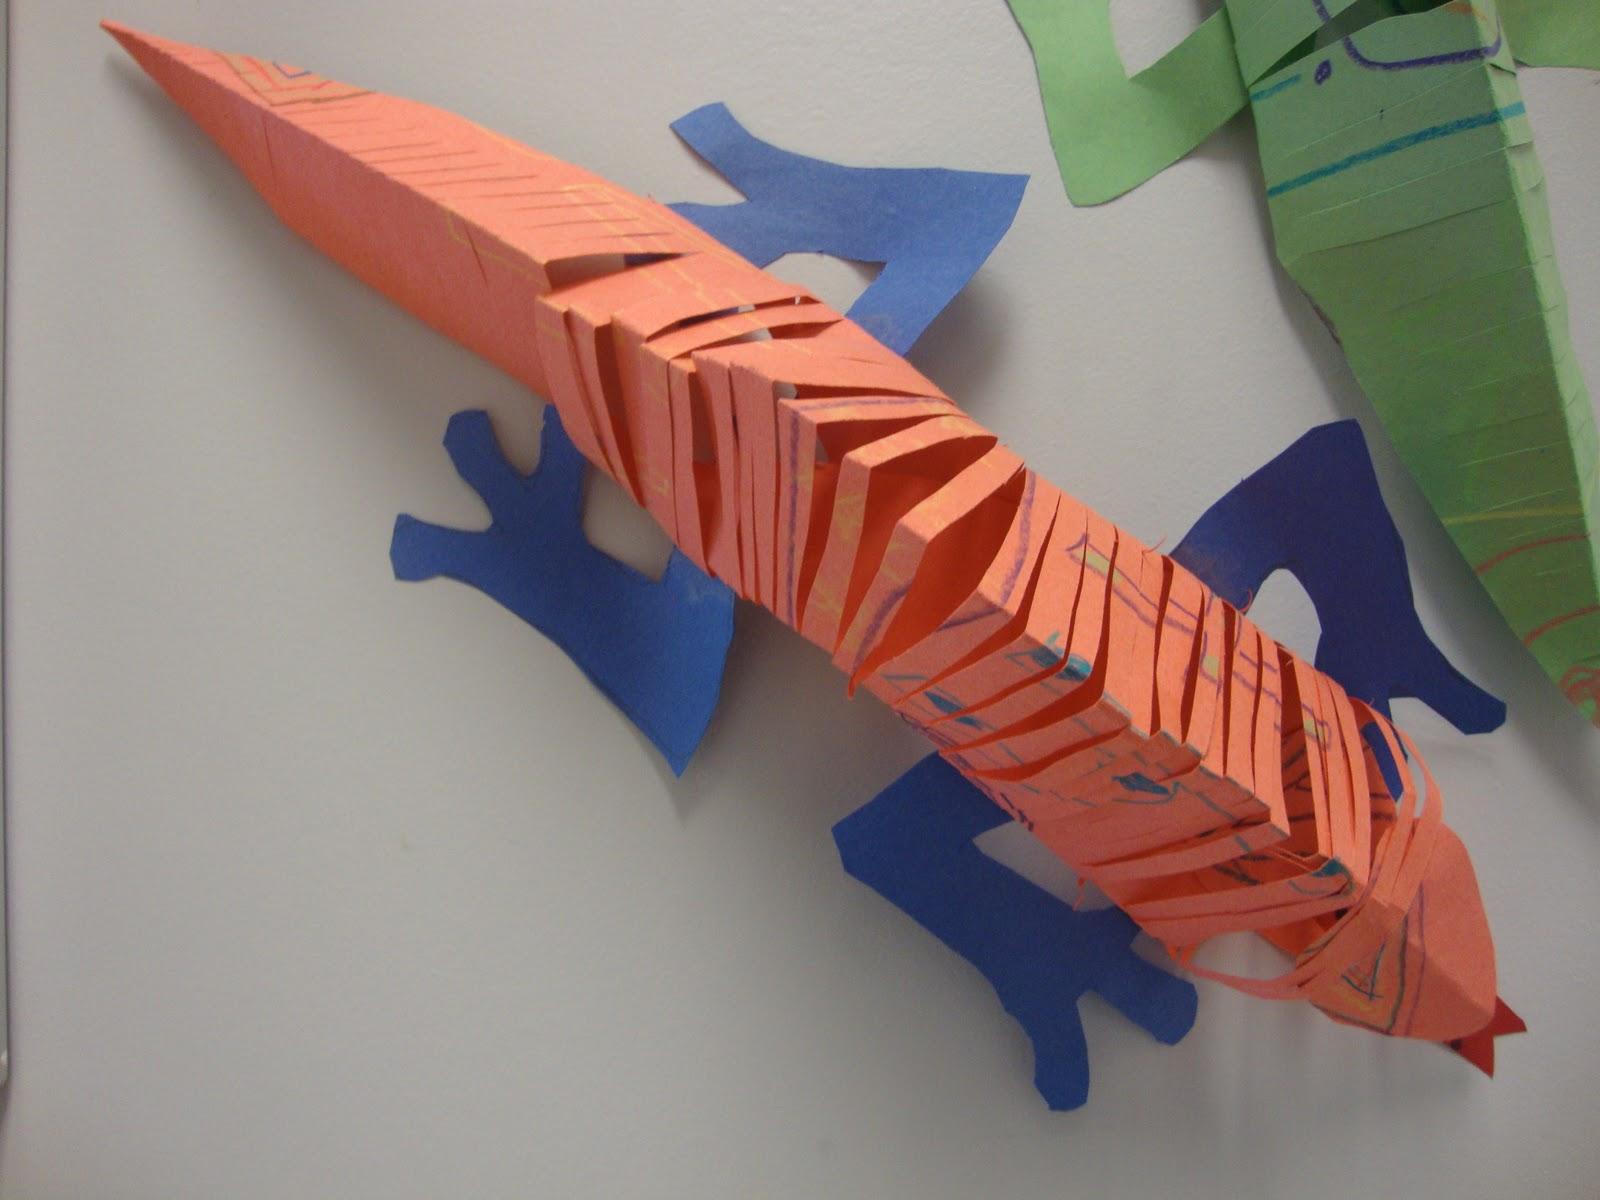 art paper scissors glue slinky lizard